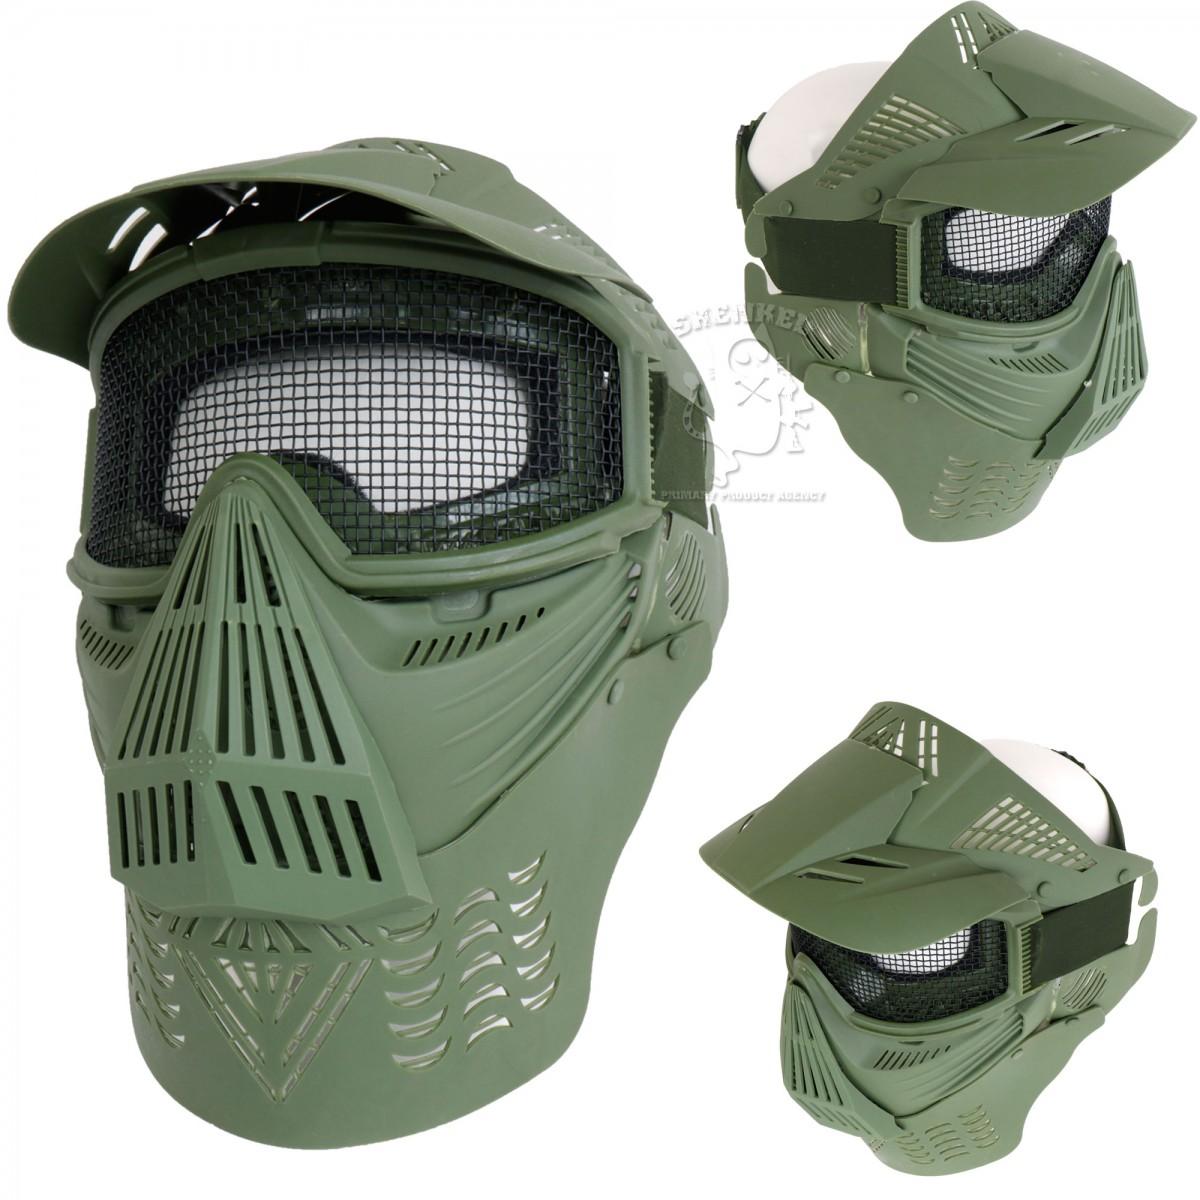 SHENKEL フルフェイス シューティングマスク メッシュゴーグル バイザー&ネックガード付き